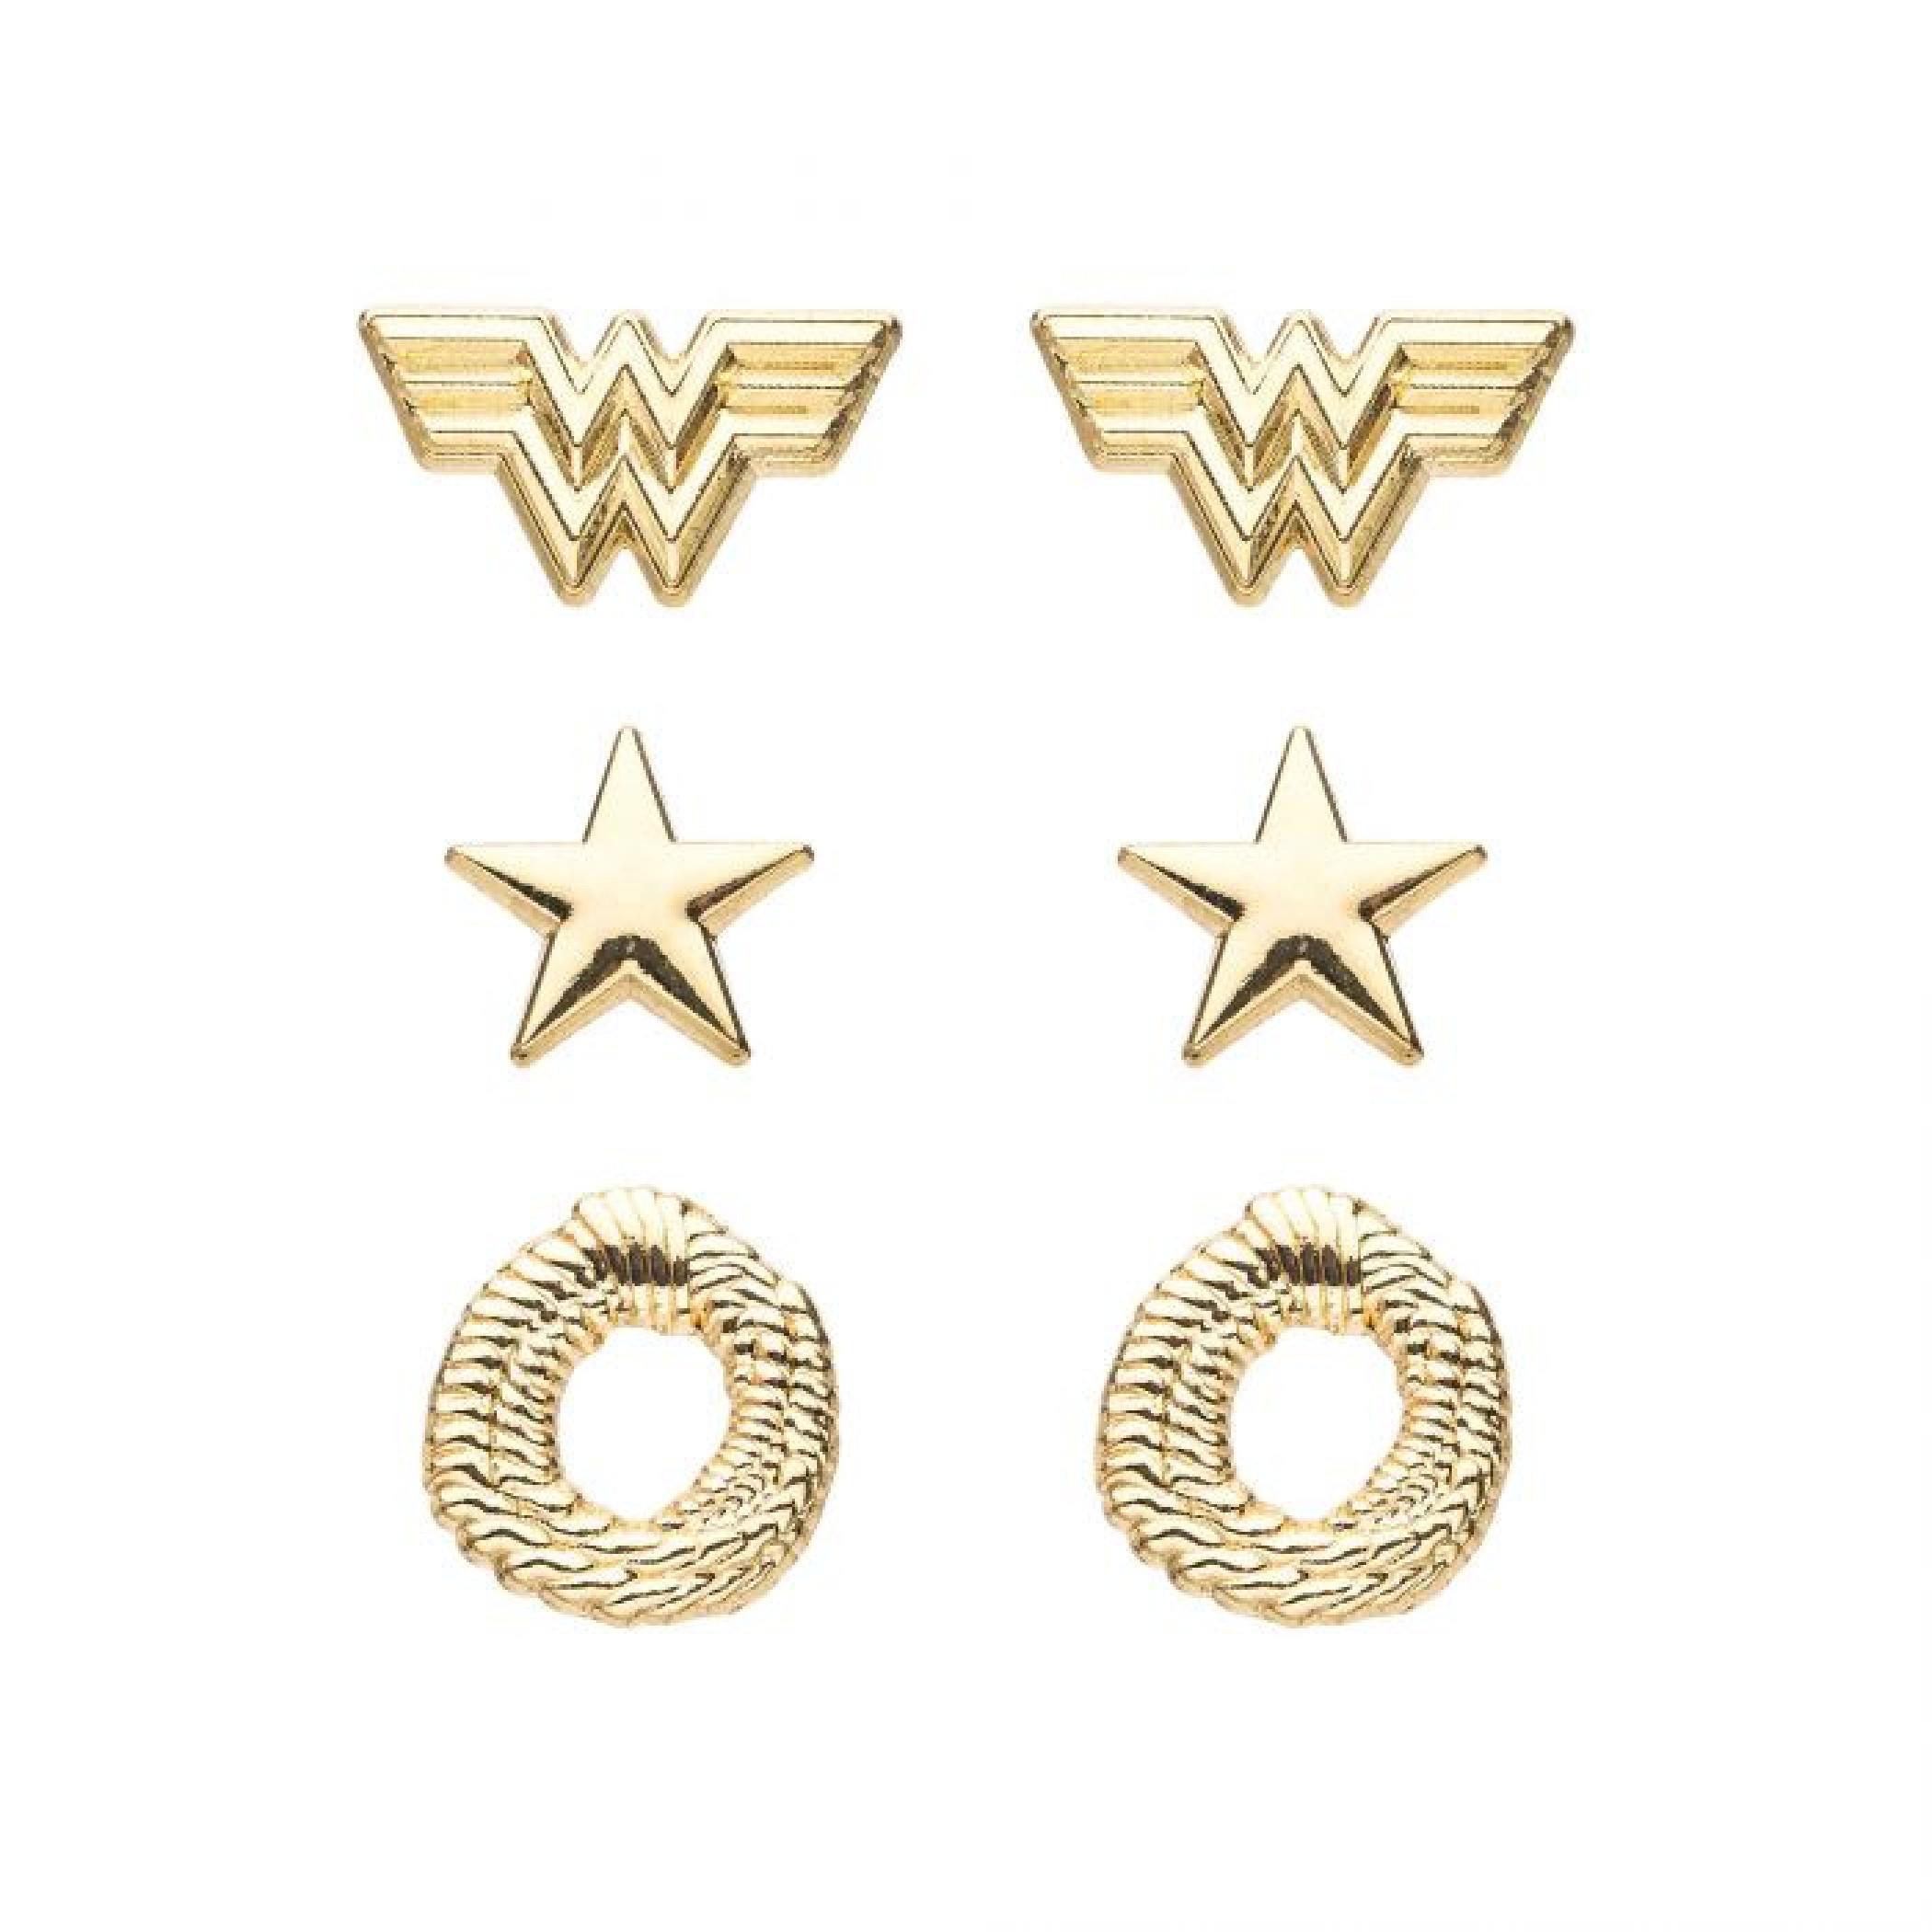 DC Comics Wonder Woman 1984 Stainless Steel Earrings Set